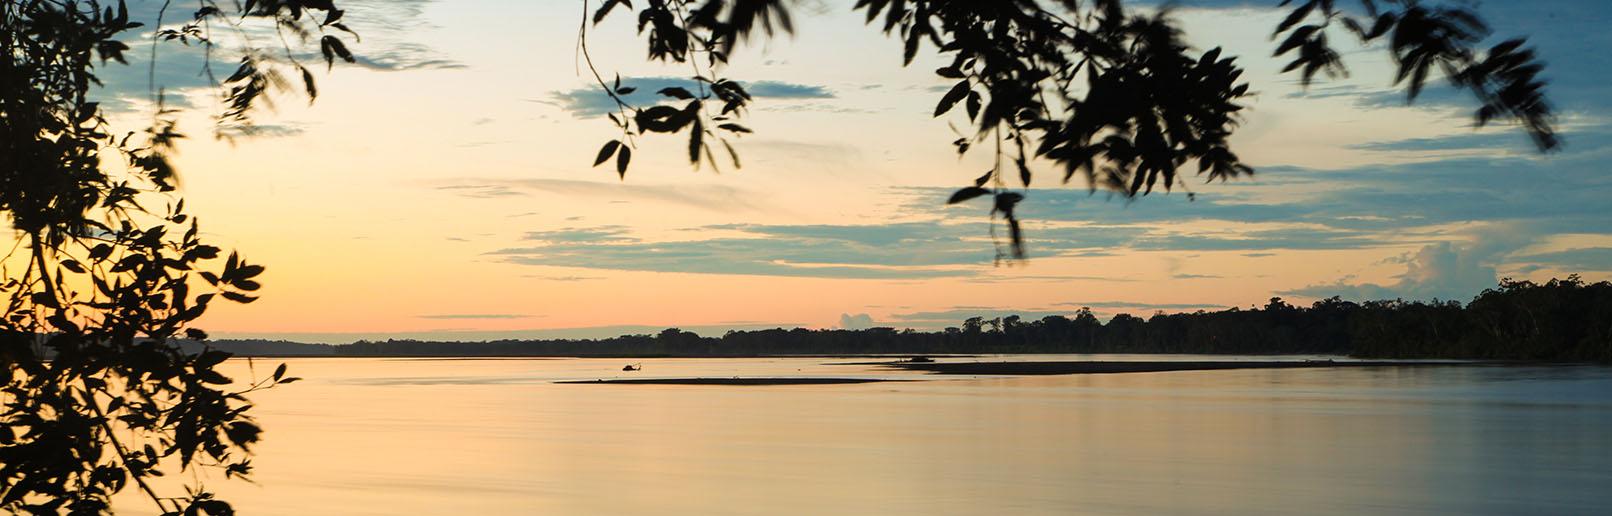 Amazon River History